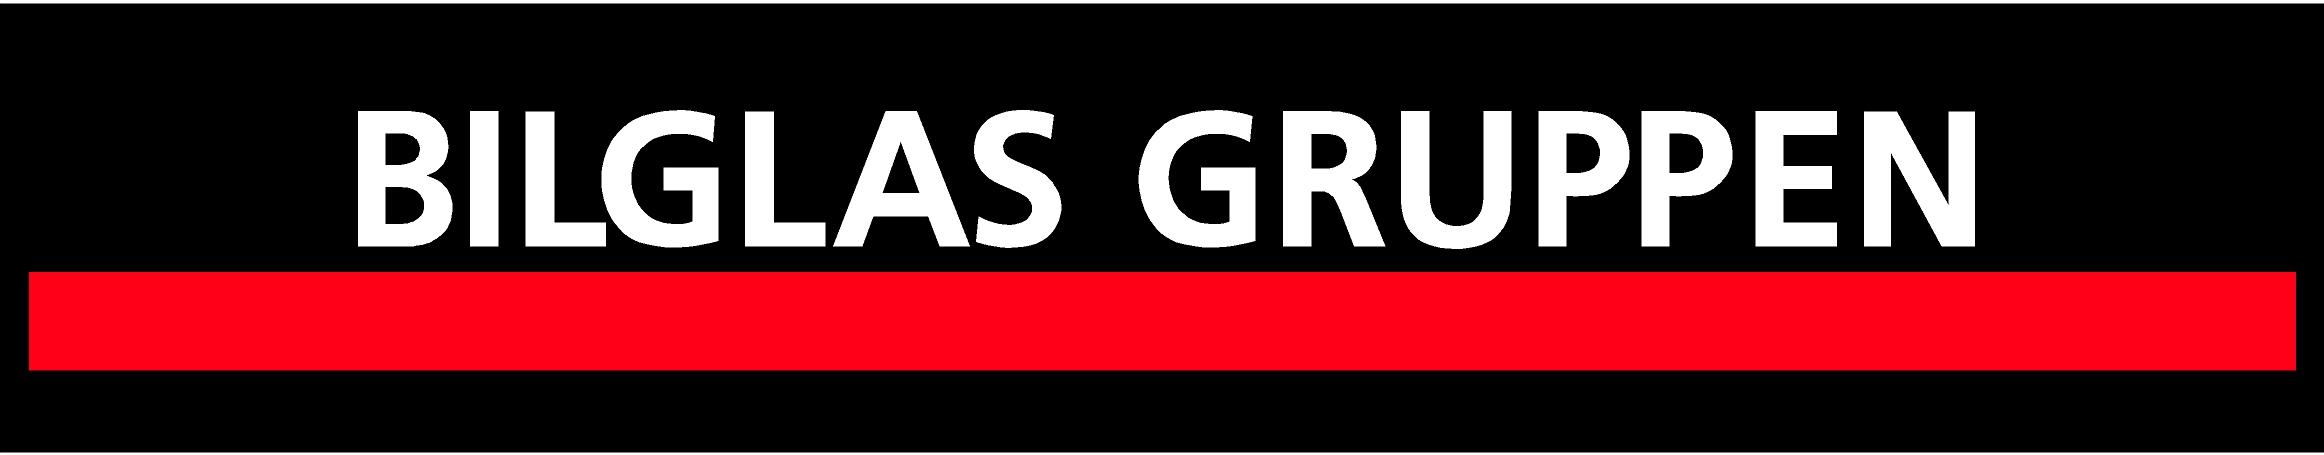 Østjysk Bilglas (Bilglasgruppen.dk) - Aarhus logo